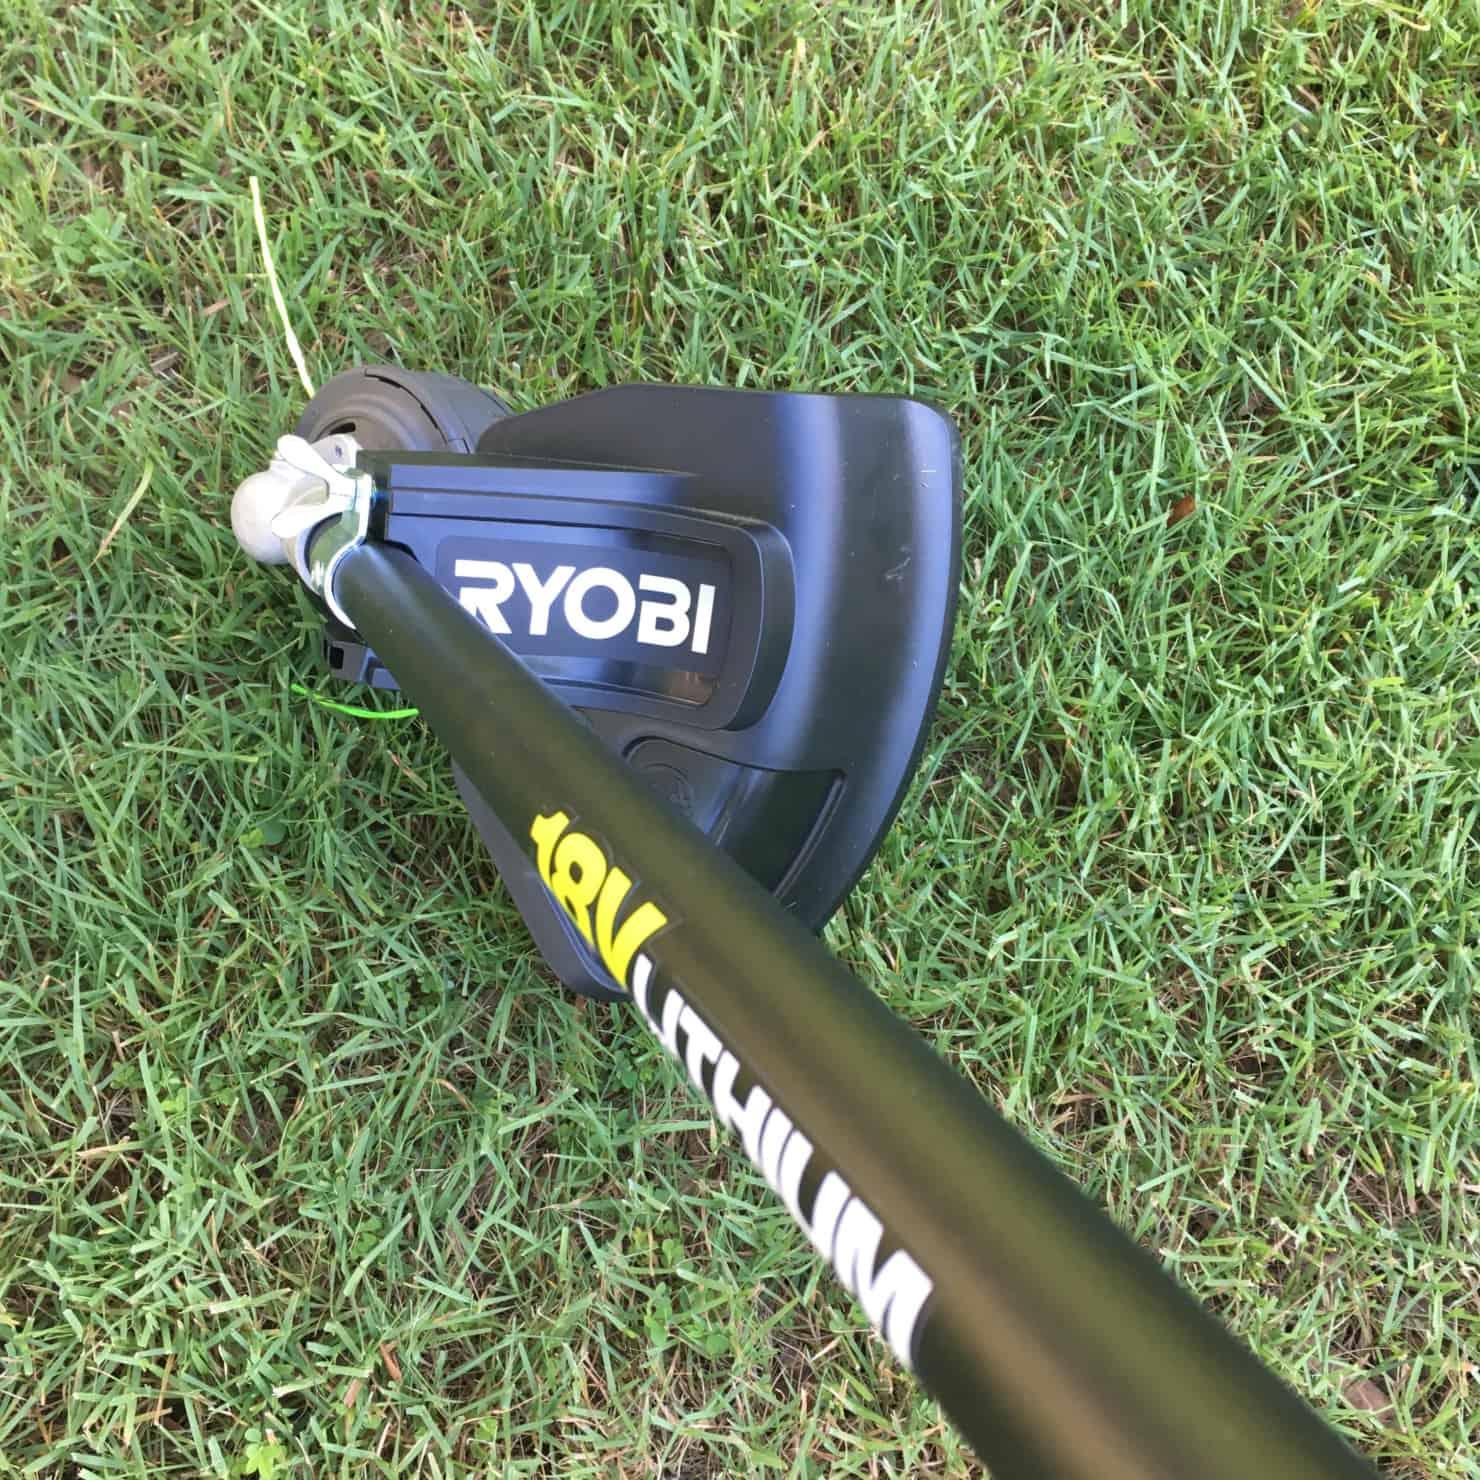 Ryobi One+ 18v Brushless Circular Saw Review - Lazy Guy DIY